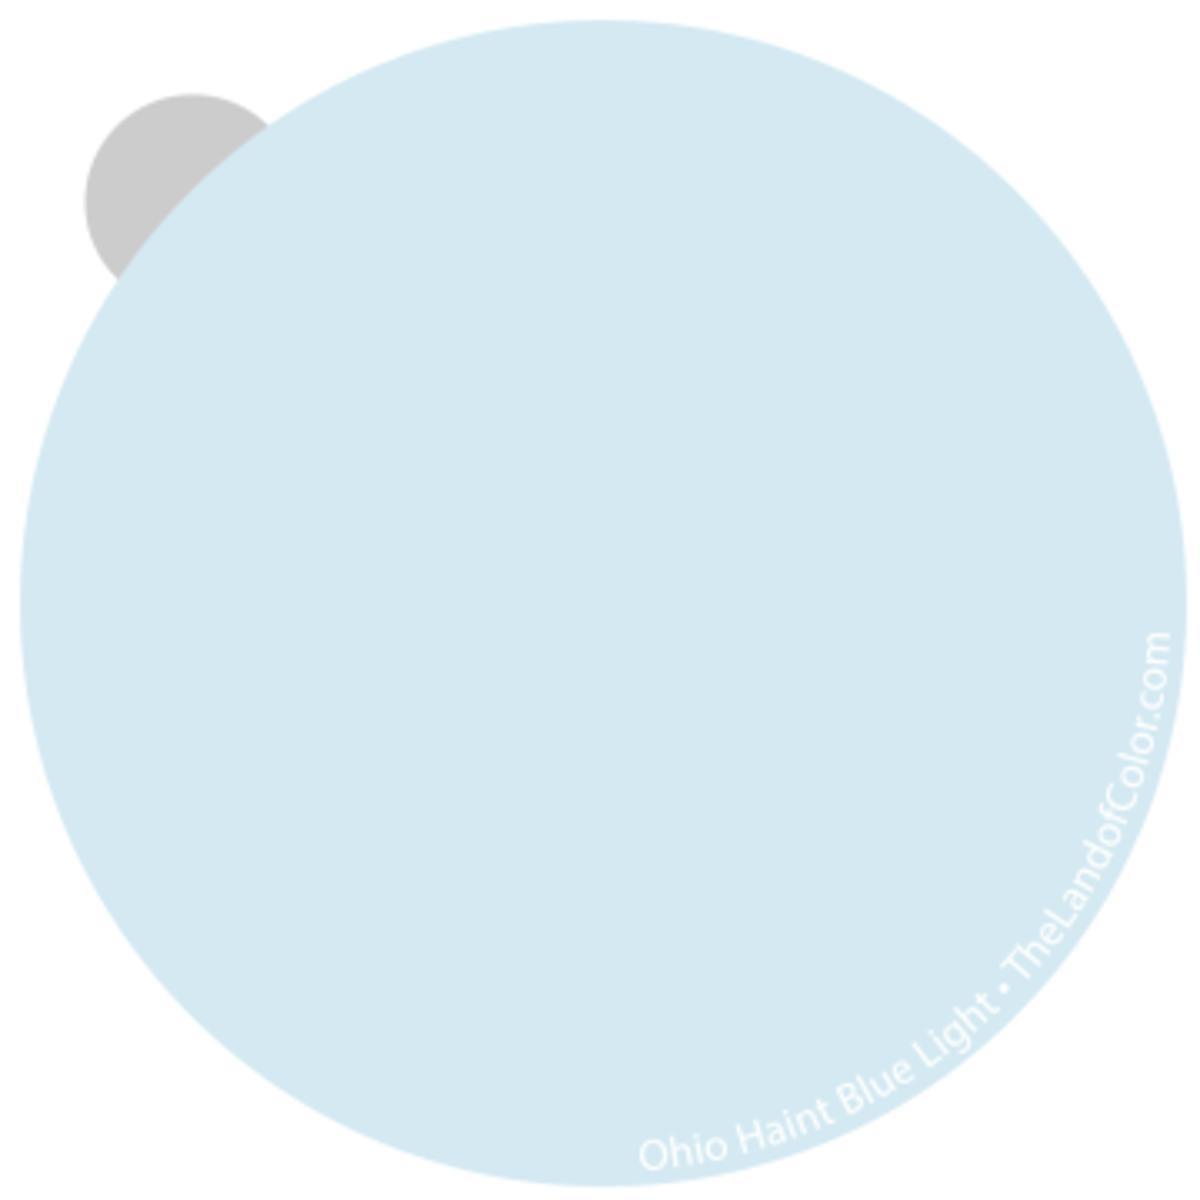 Ohio Haint Blue - Light